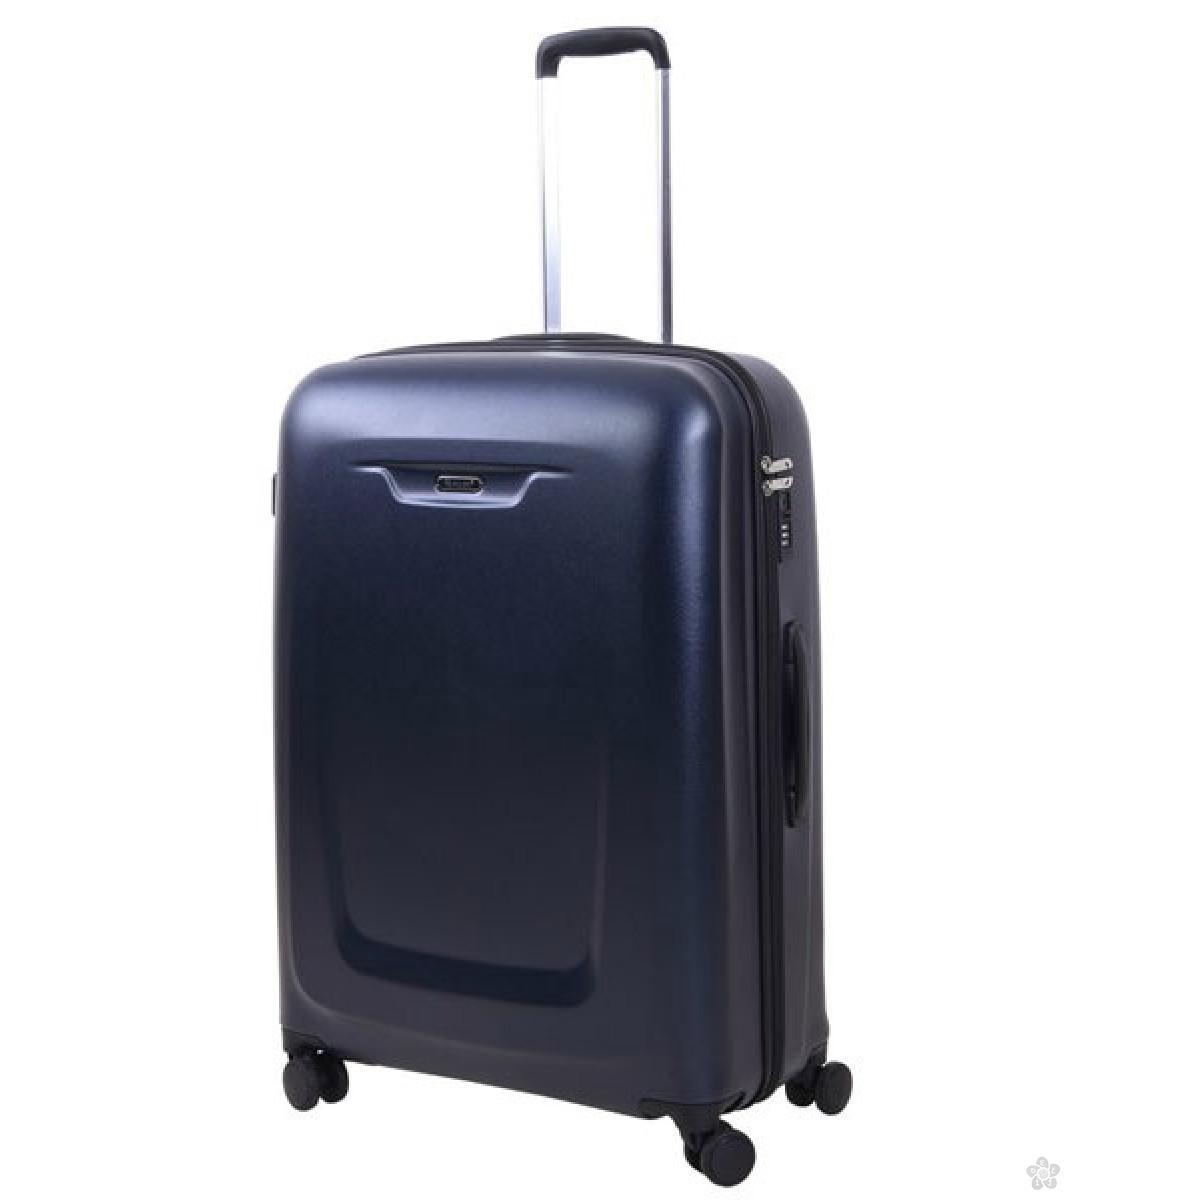 Kofer Pulse Manhattan tamno plavi 28inch X21152